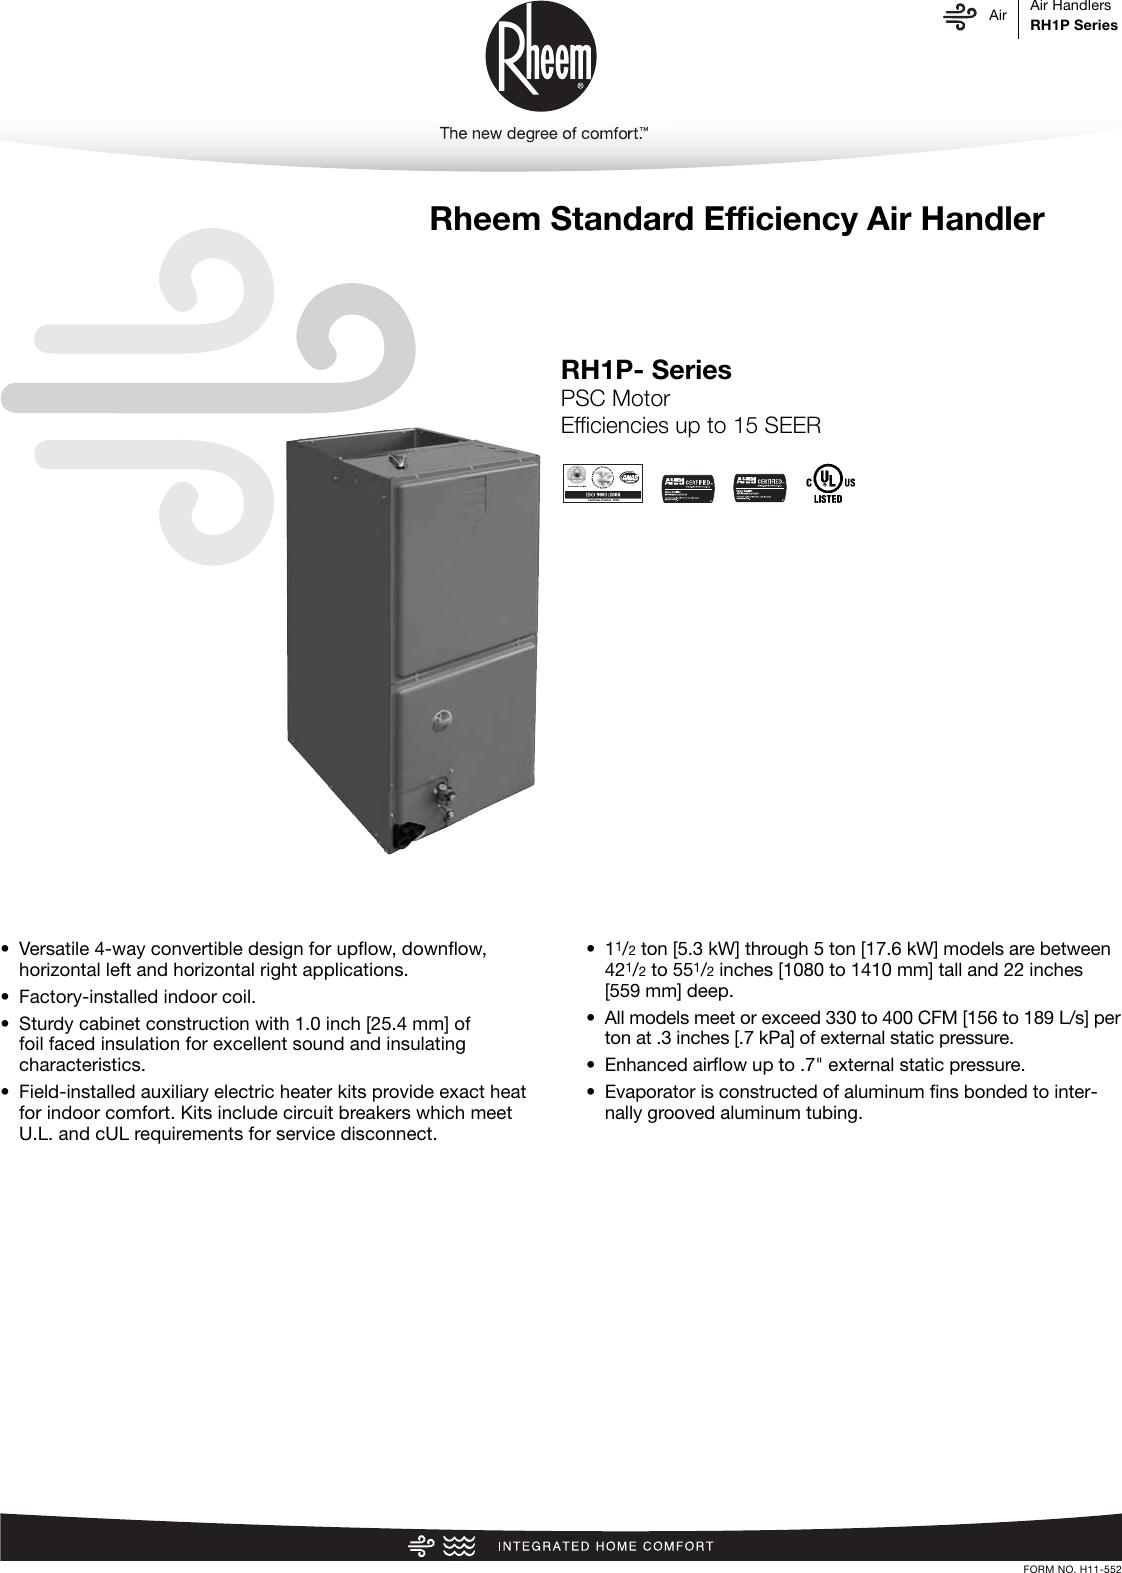 hight resolution of rheem standard efficiency up to 15 seer psc motor rh1p specification sheet